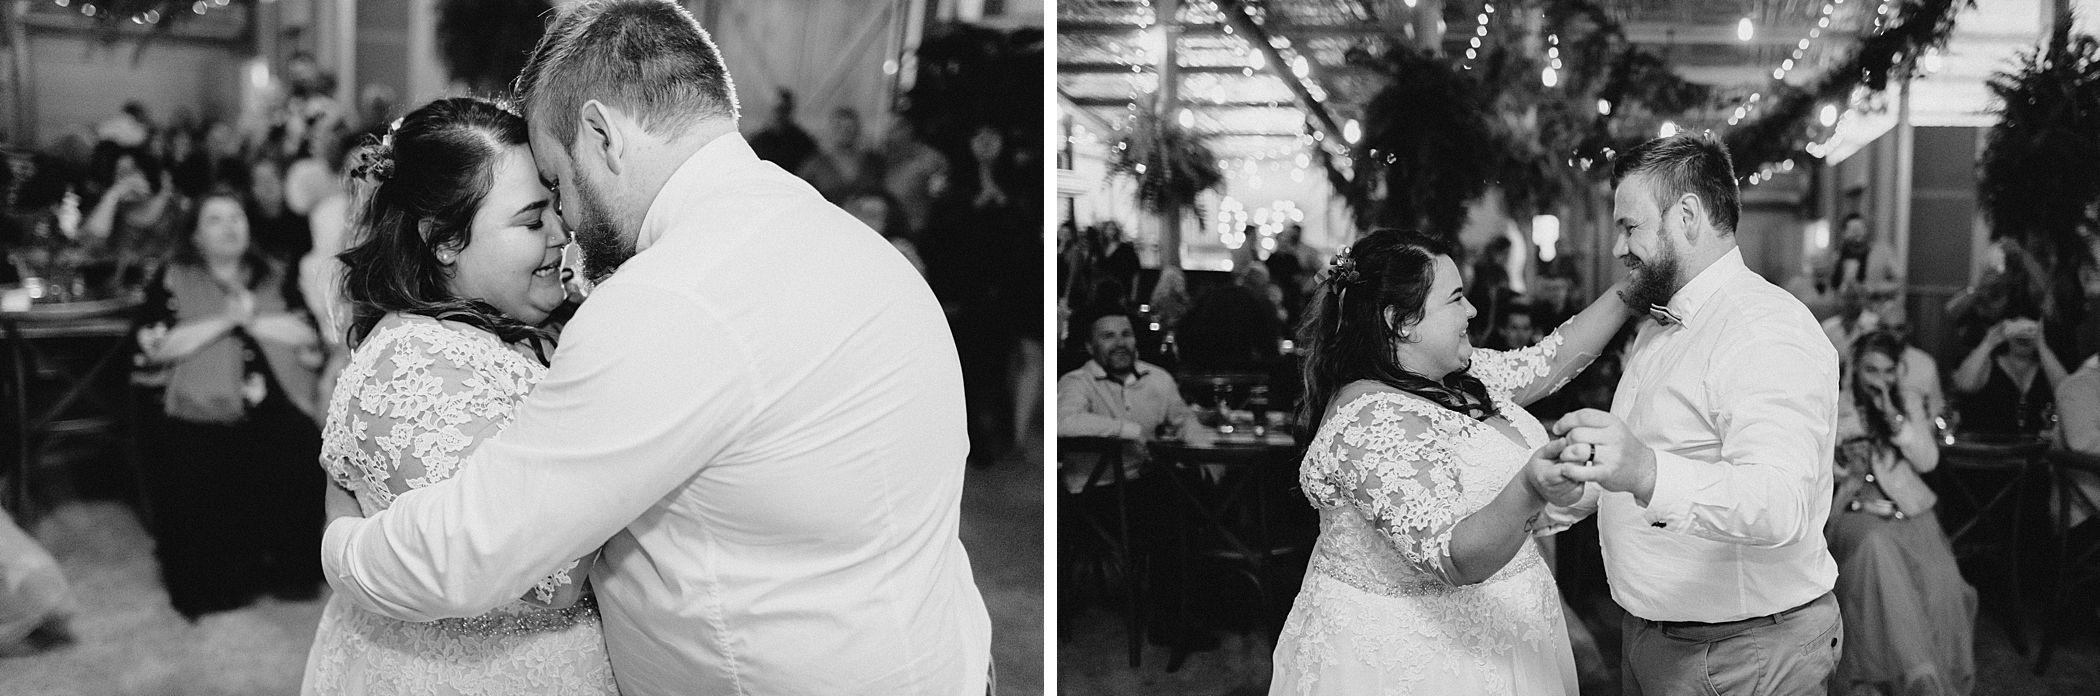 lauren-anne-photography-newcastle-hunter-valley-wedding-photographer_1277.jpg